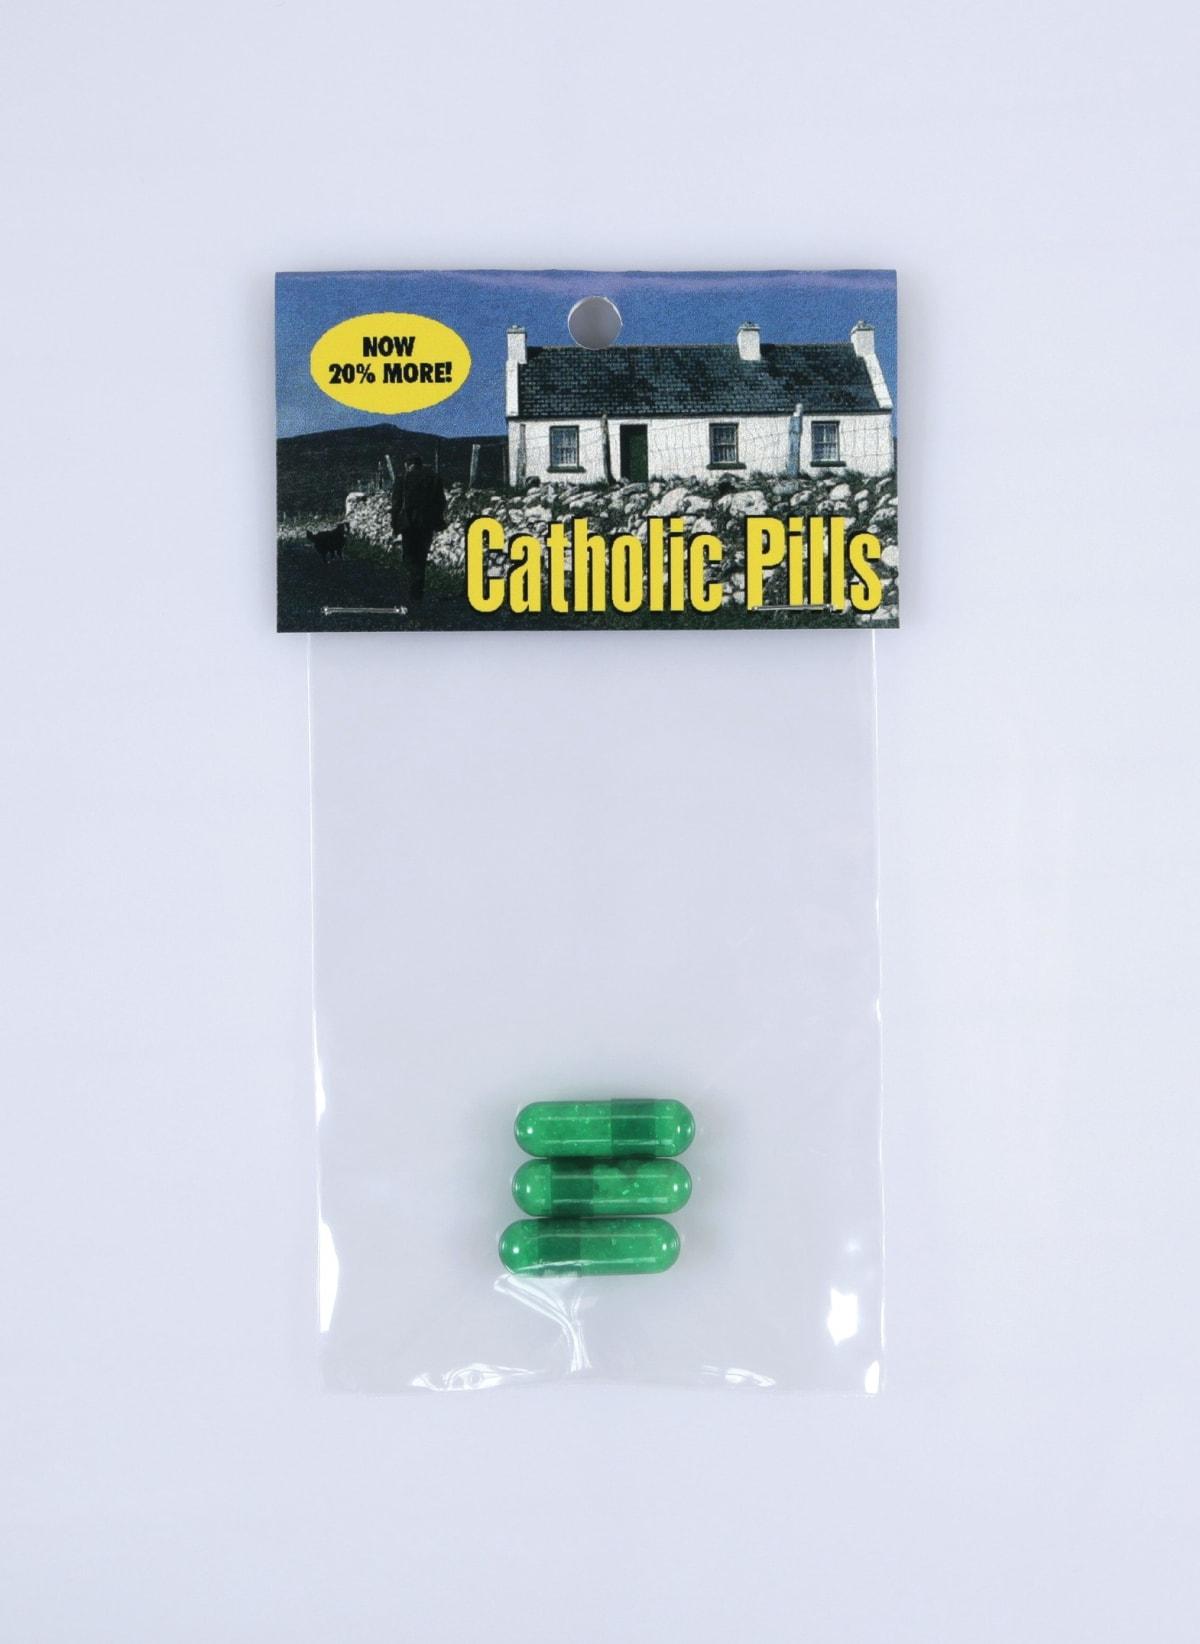 Catholic pills